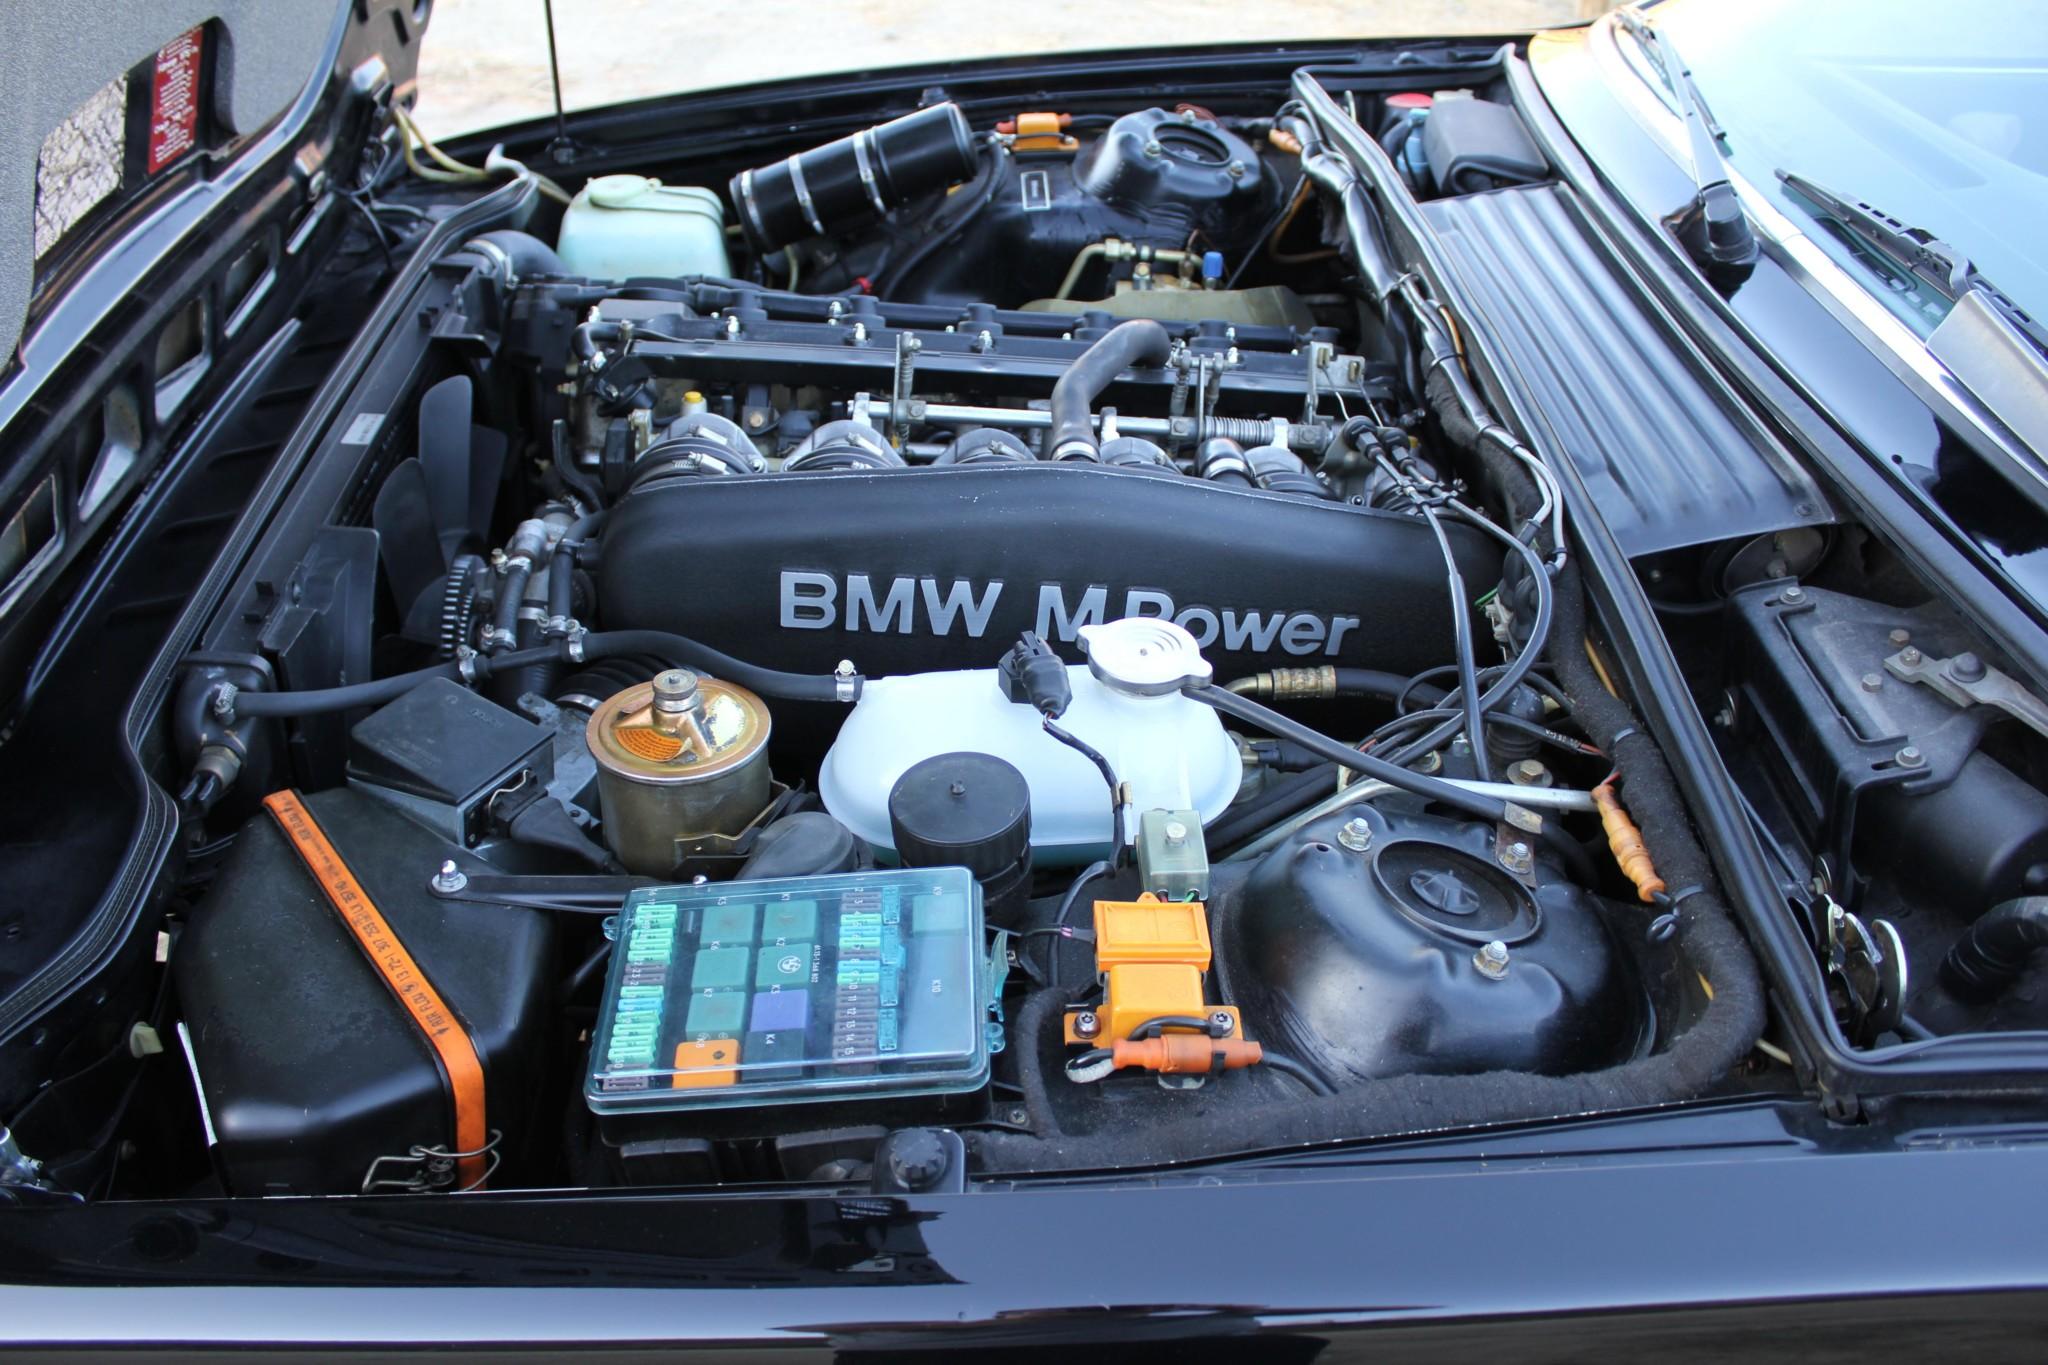 1988 bmw M6 kent classic cars (80).jpg